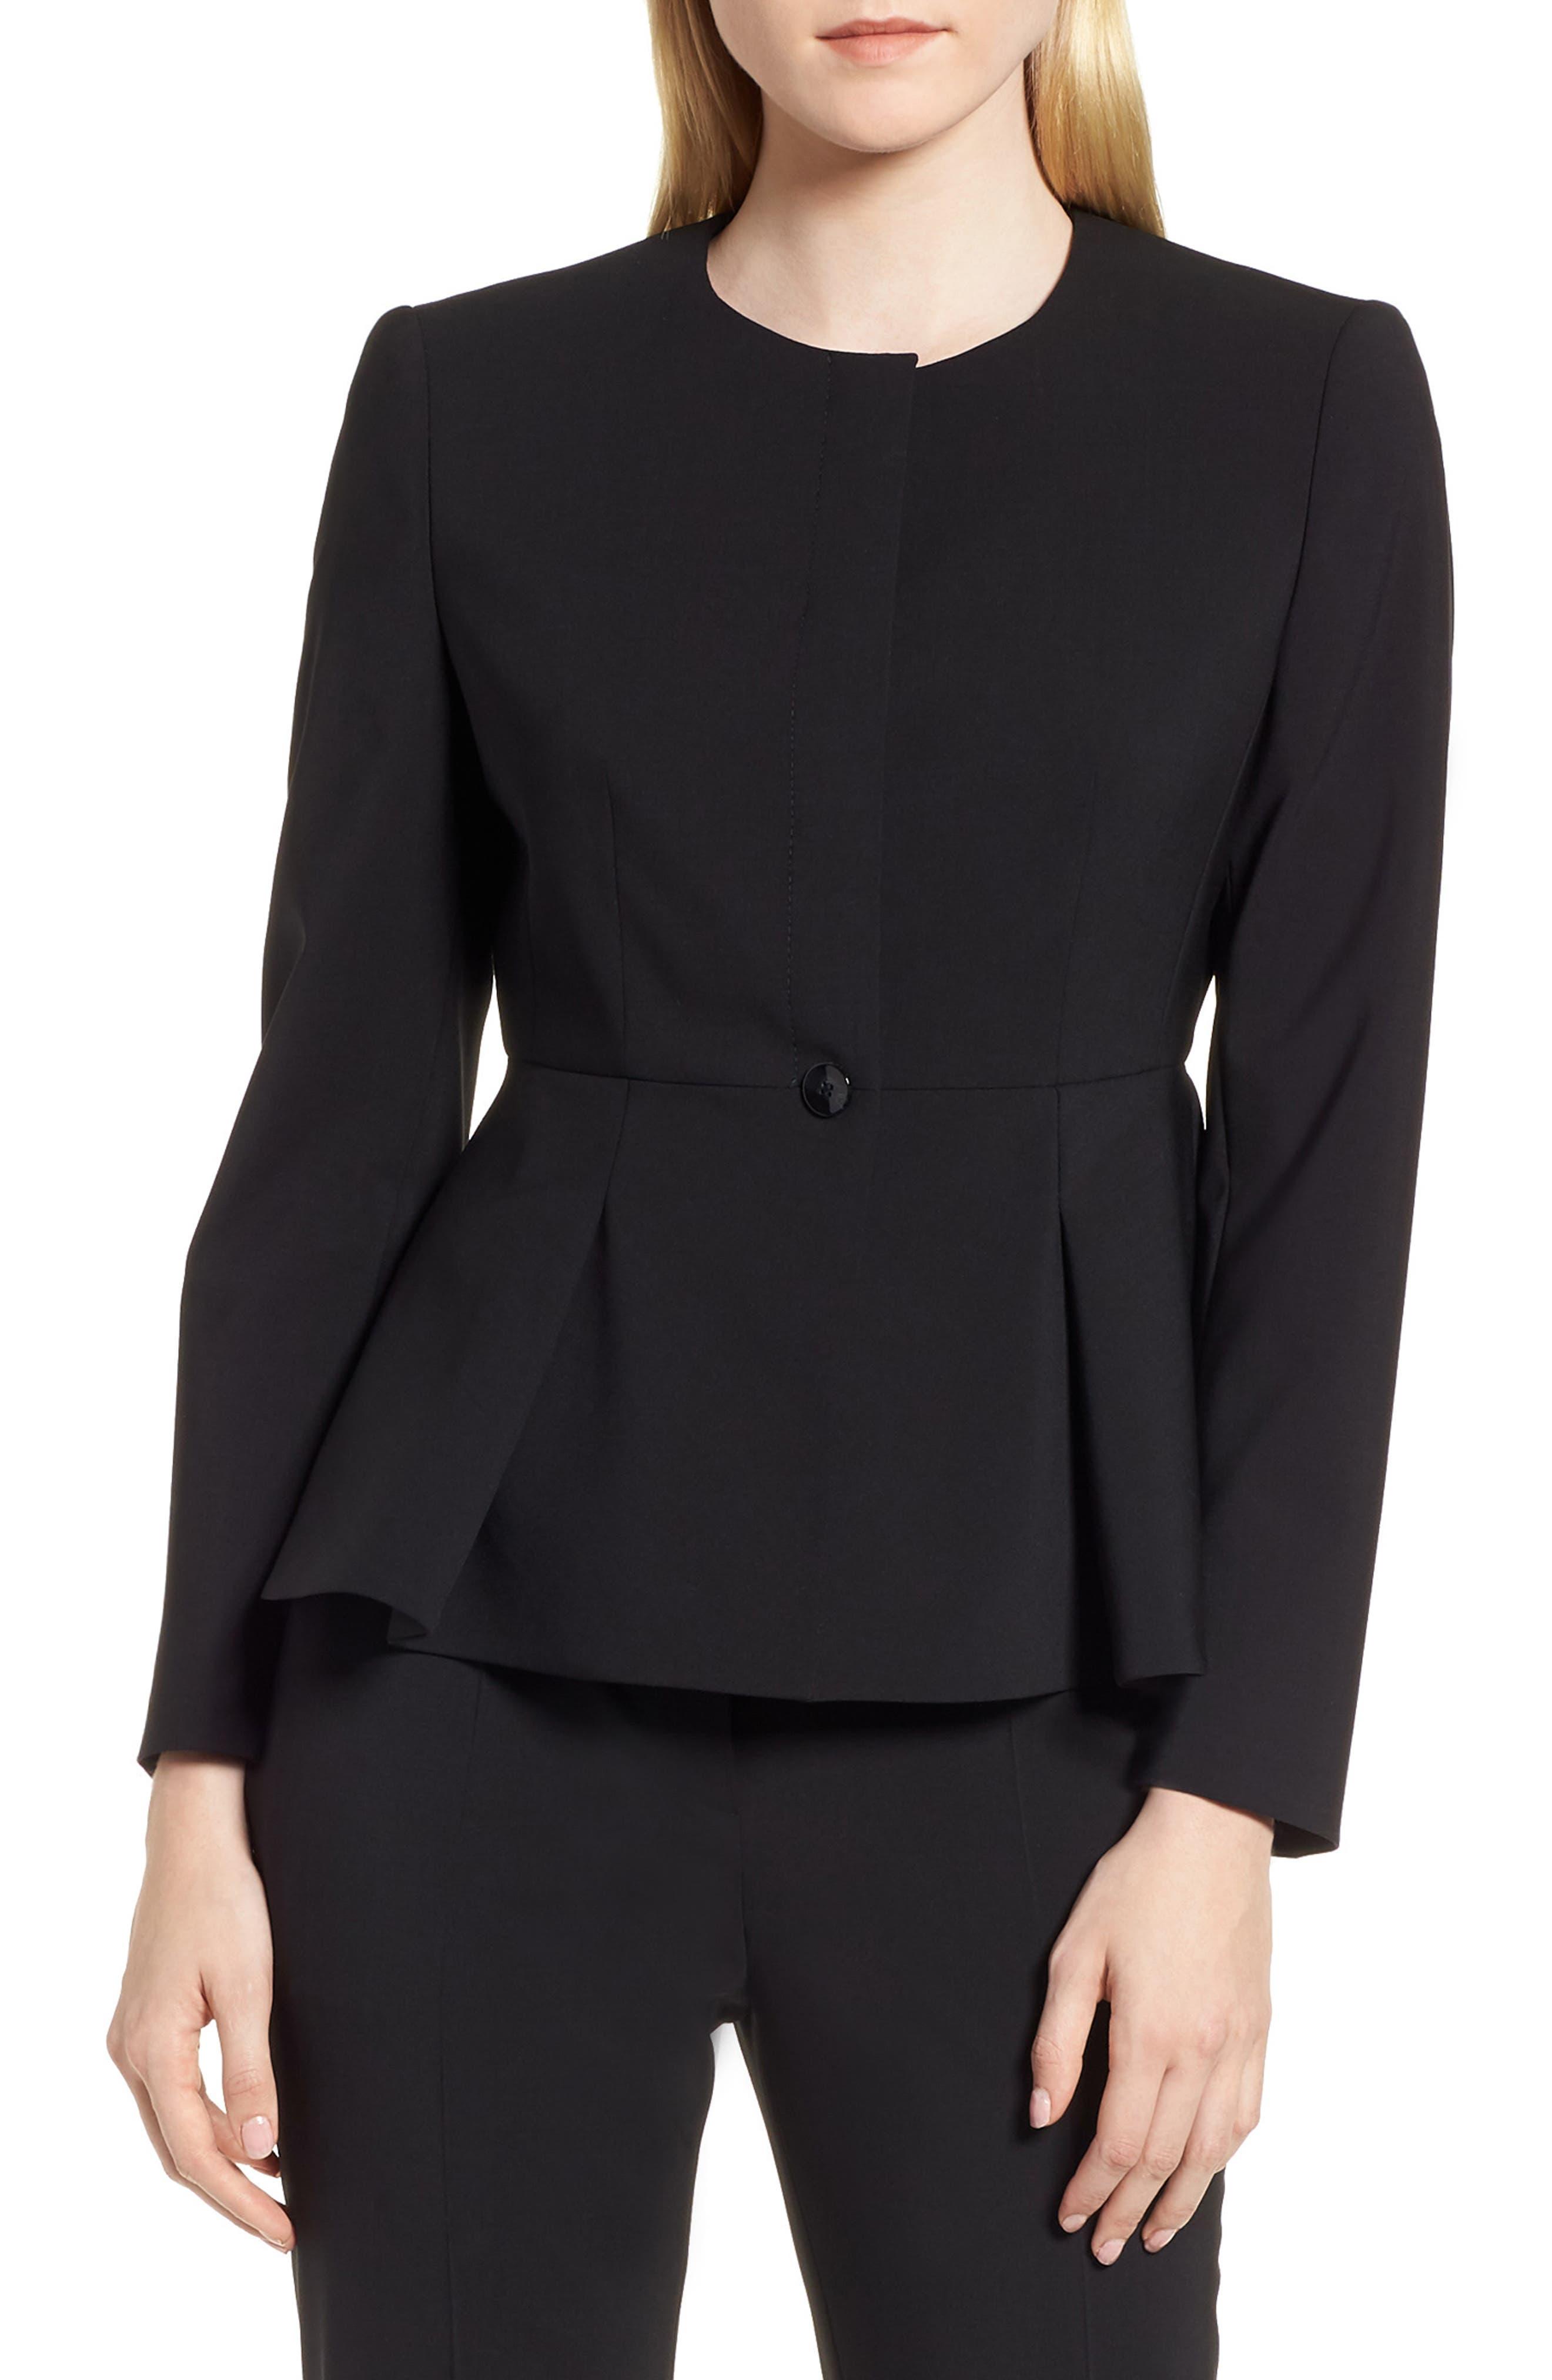 Jolanna Tropical Stretch Wool Jacket,                         Main,                         color, 001